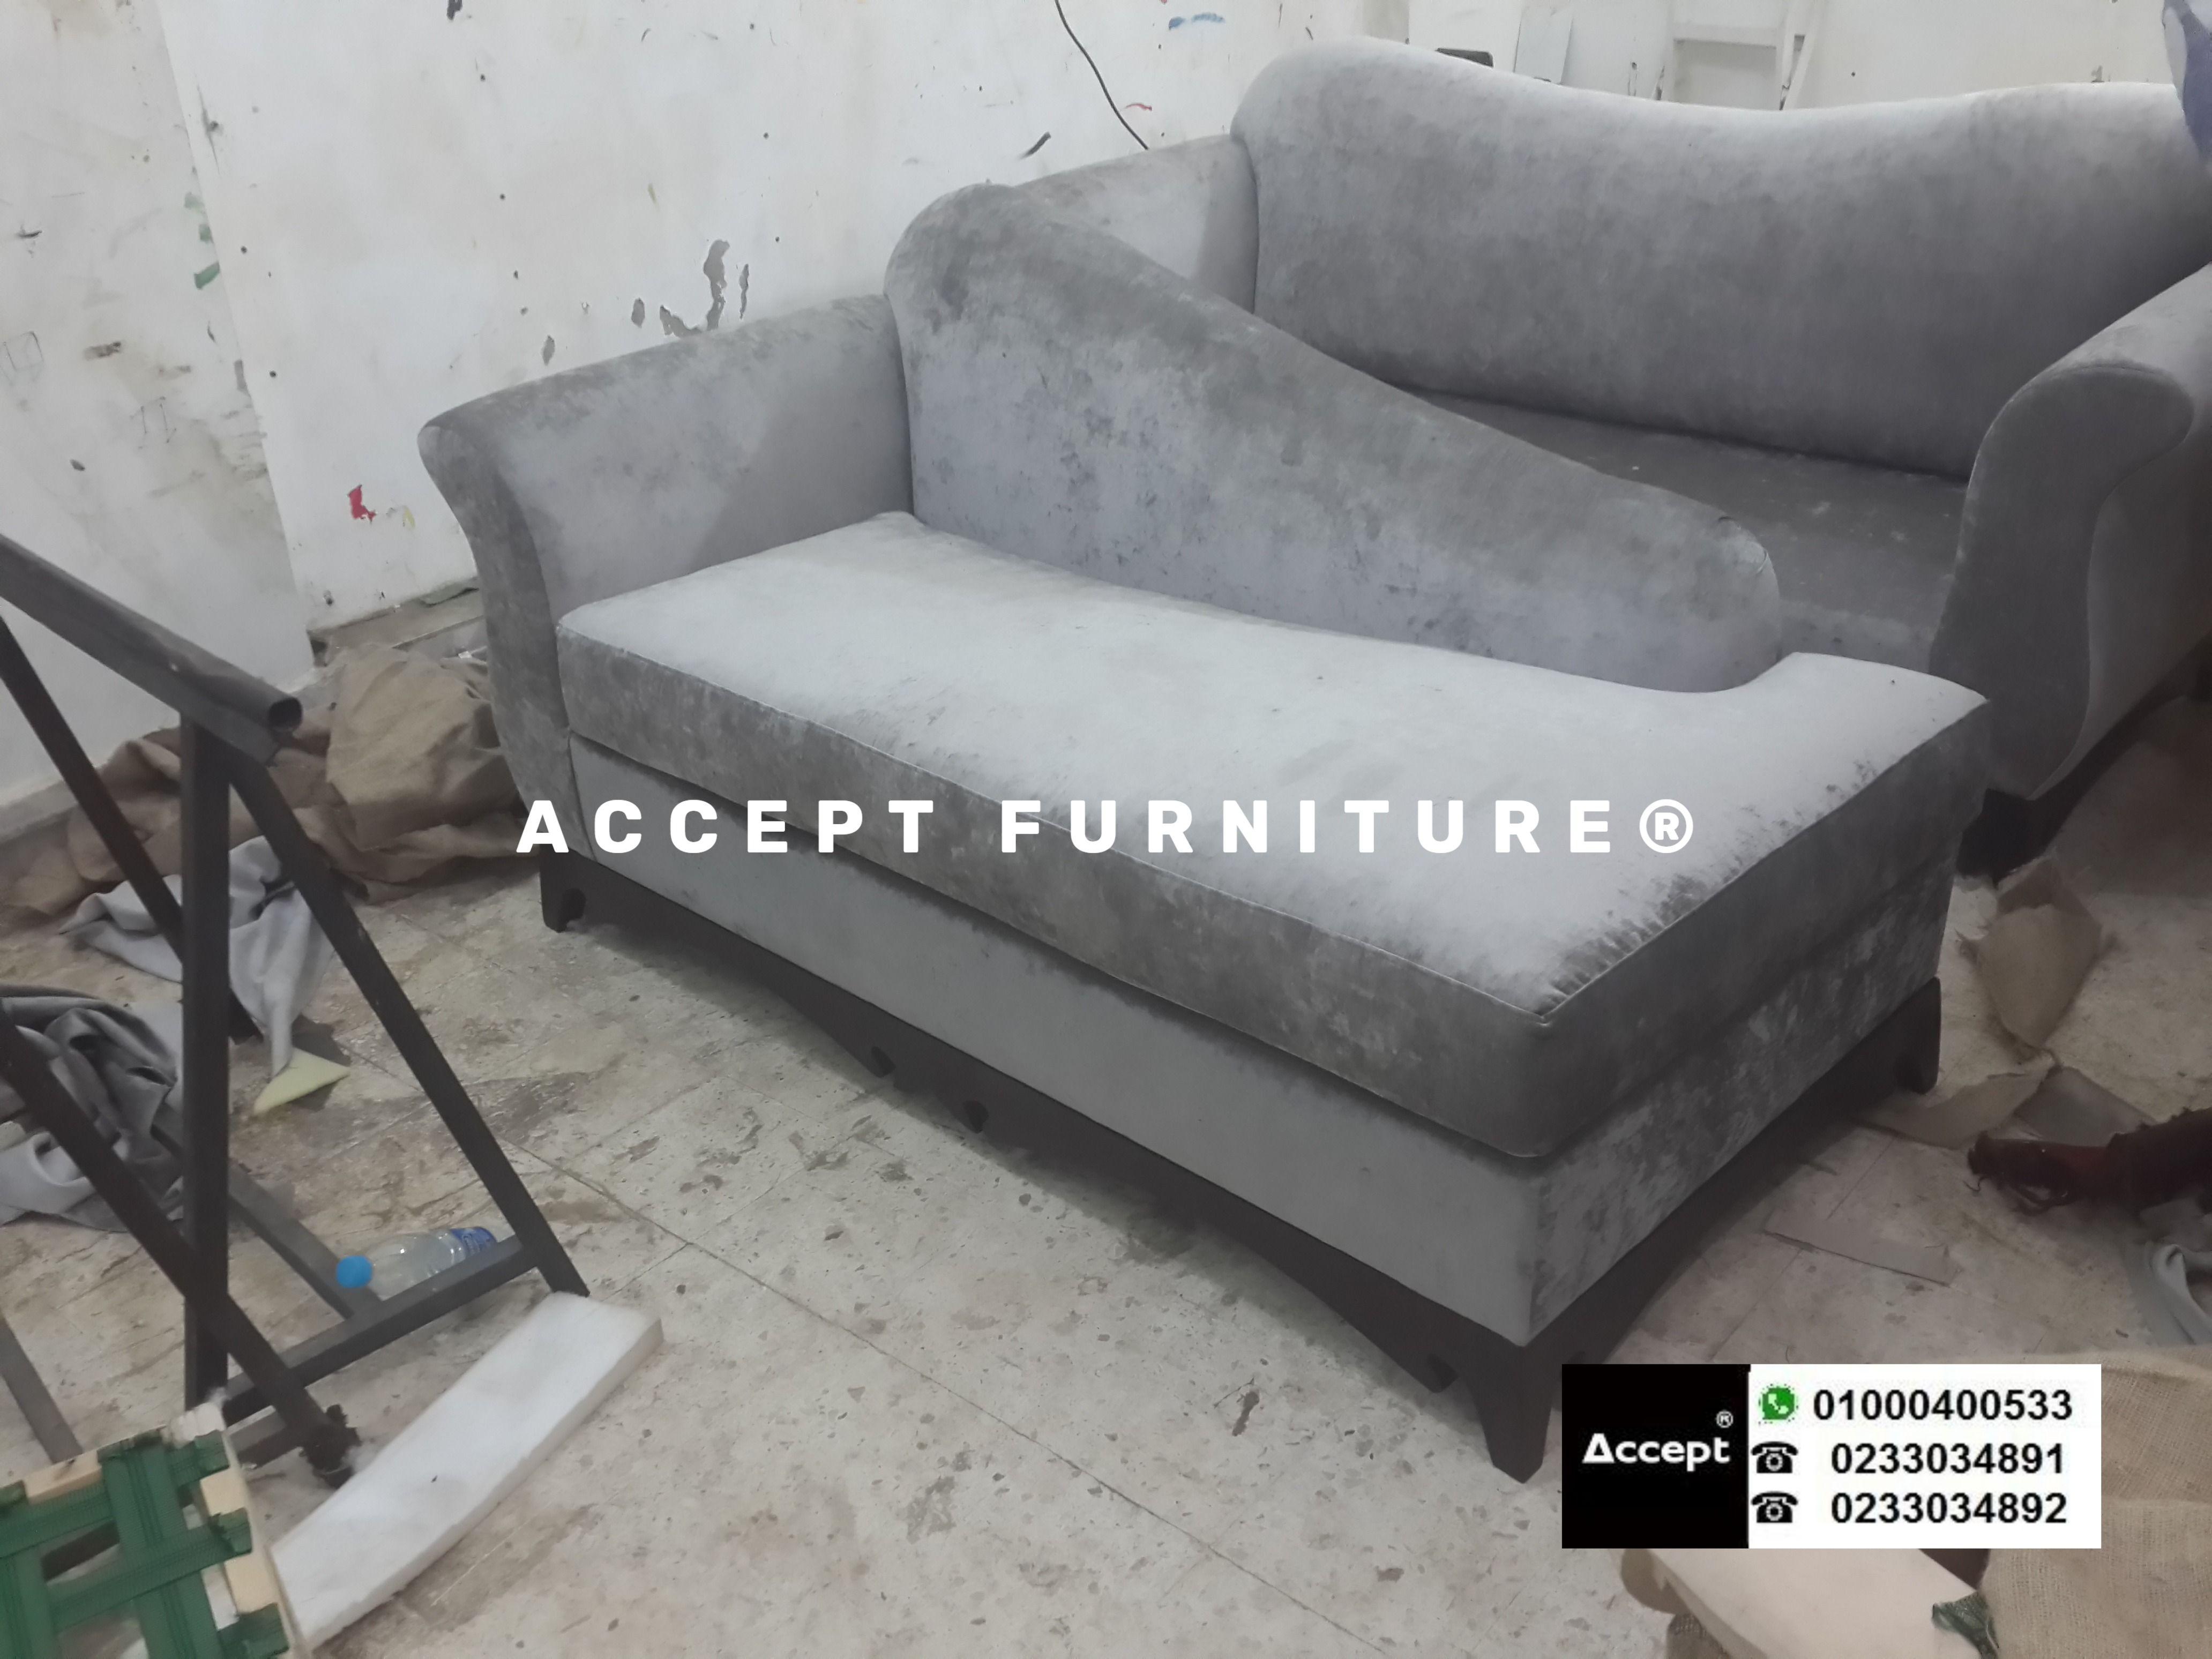 اثاث مودرن ركنات موردن انتريهات مودرن Furniture Chaise Lounge Home Decor